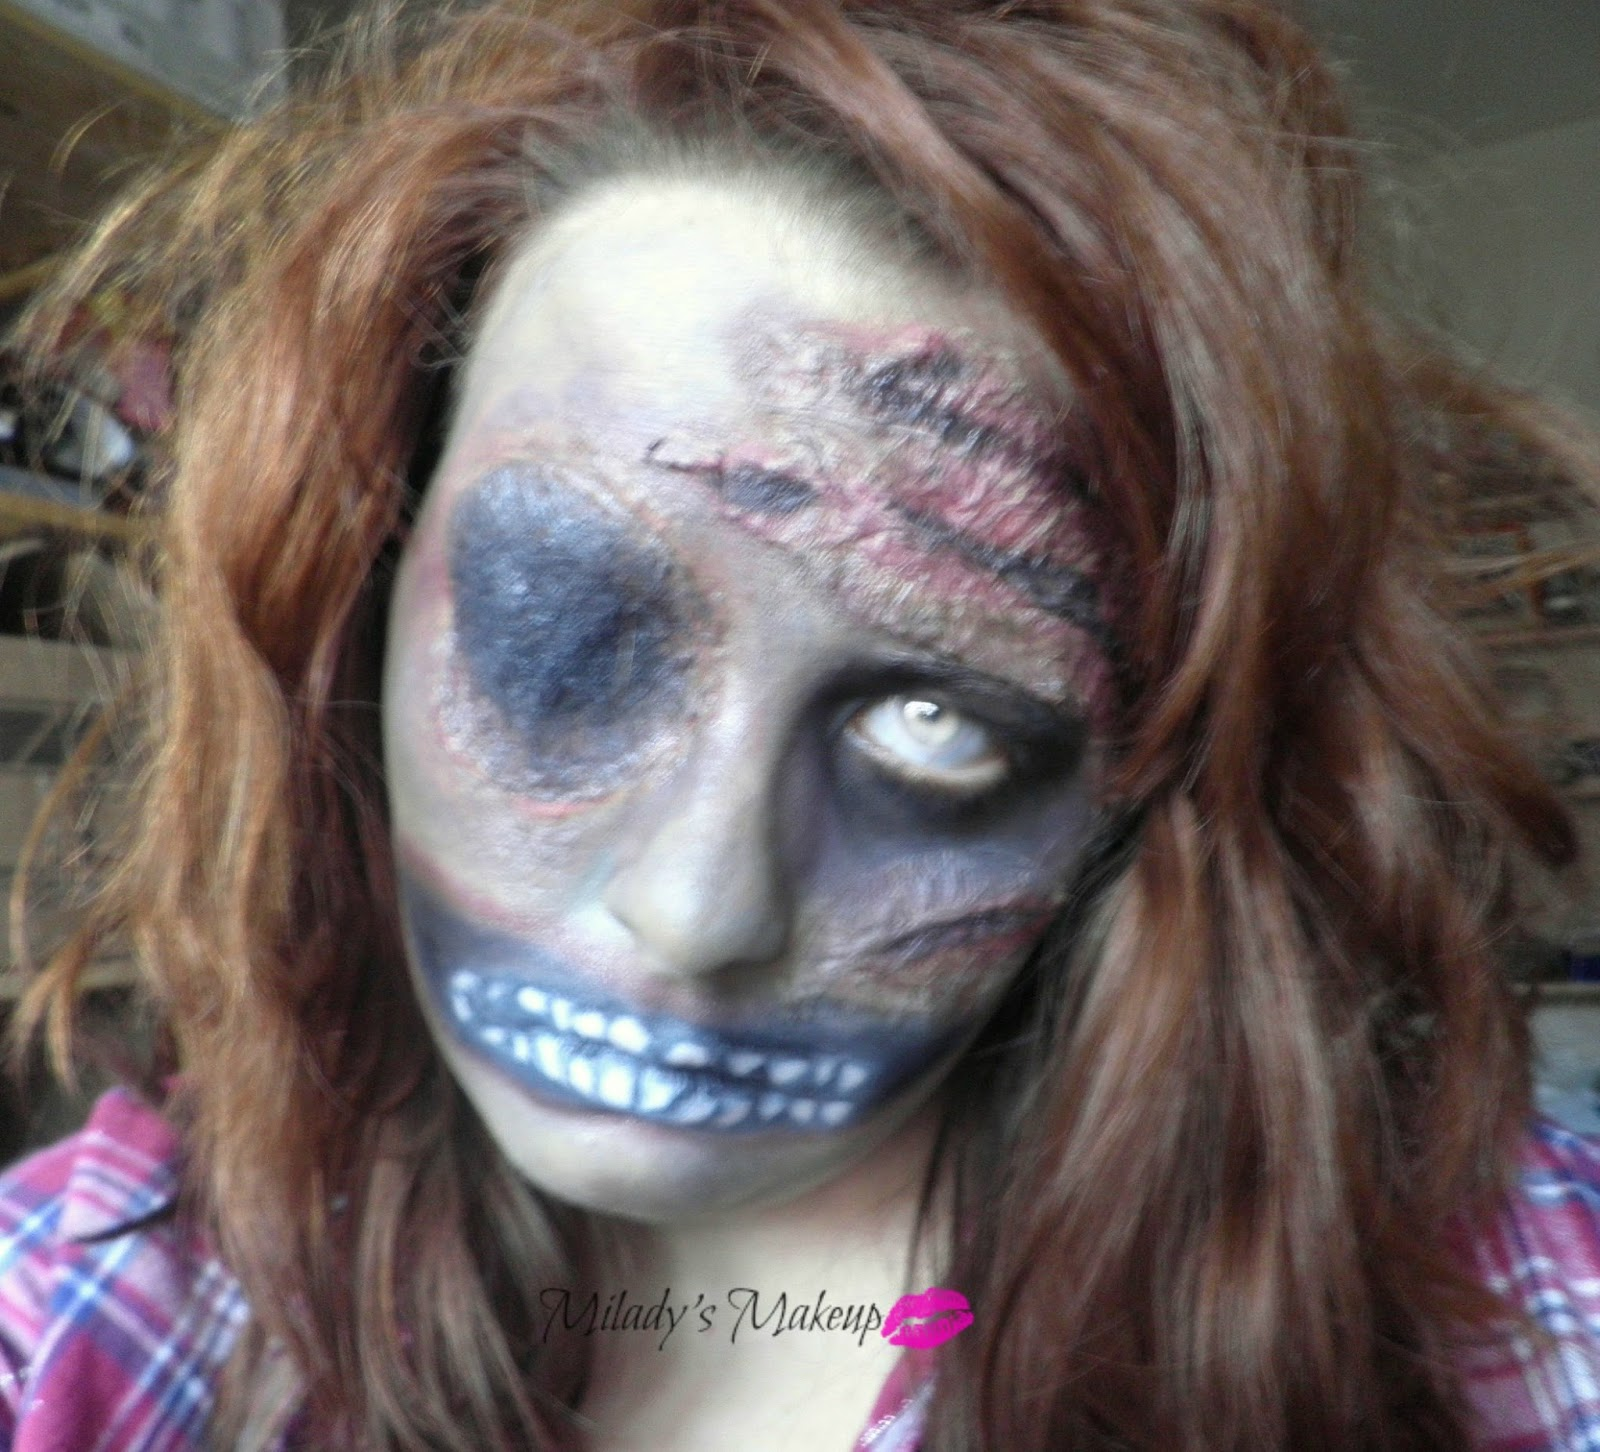 http://www.miladymakeup.com/2013/10/reto-halloween-zombies.html